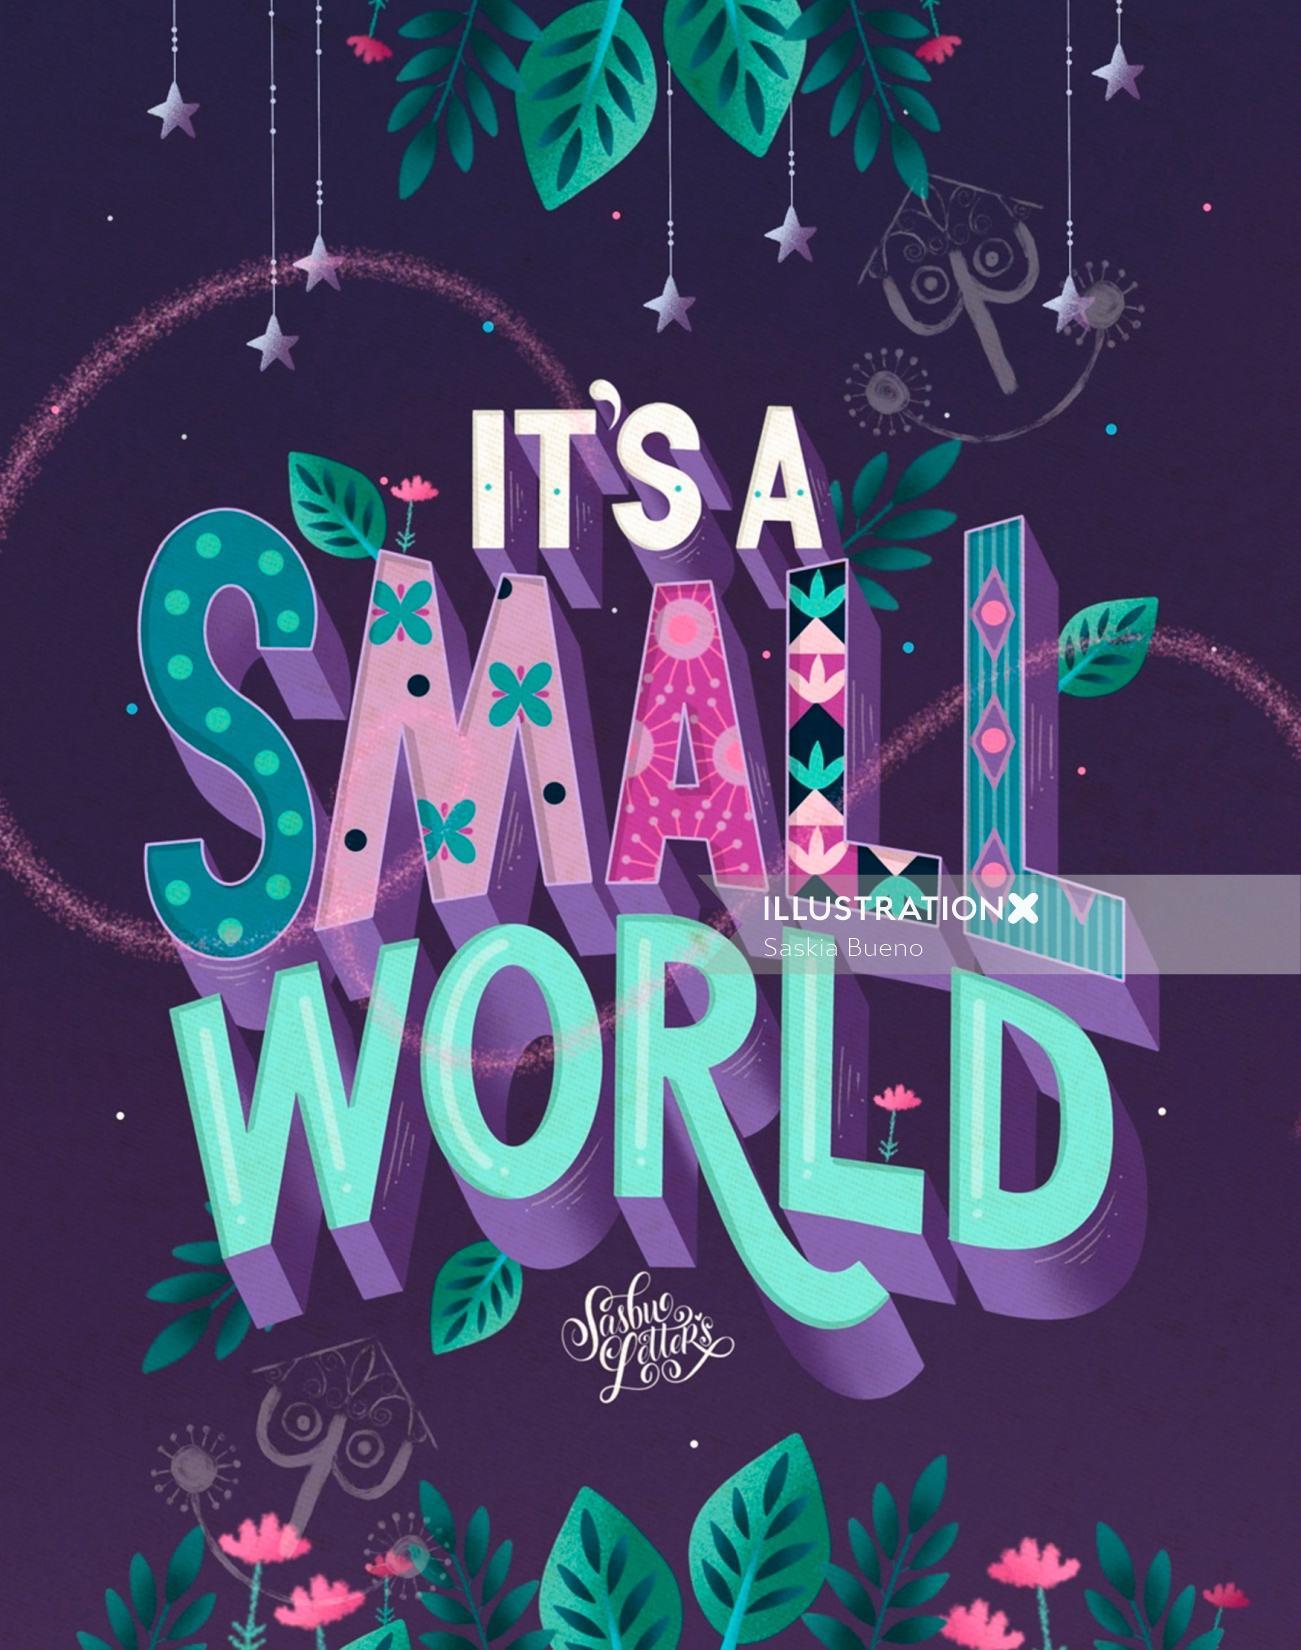 Typography art of it's samll world